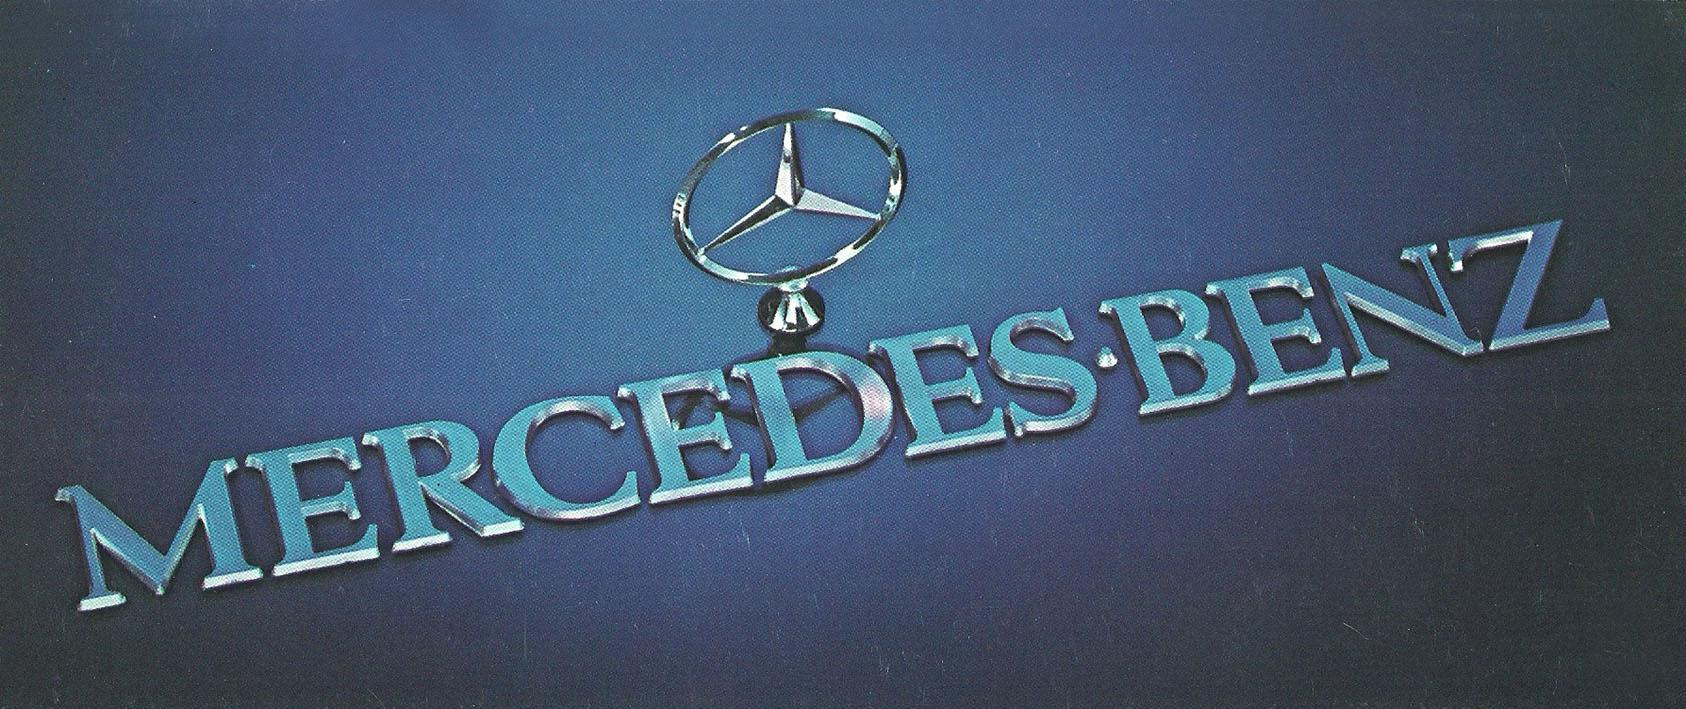 1975 Mercedes-Benz Mercedes Benz